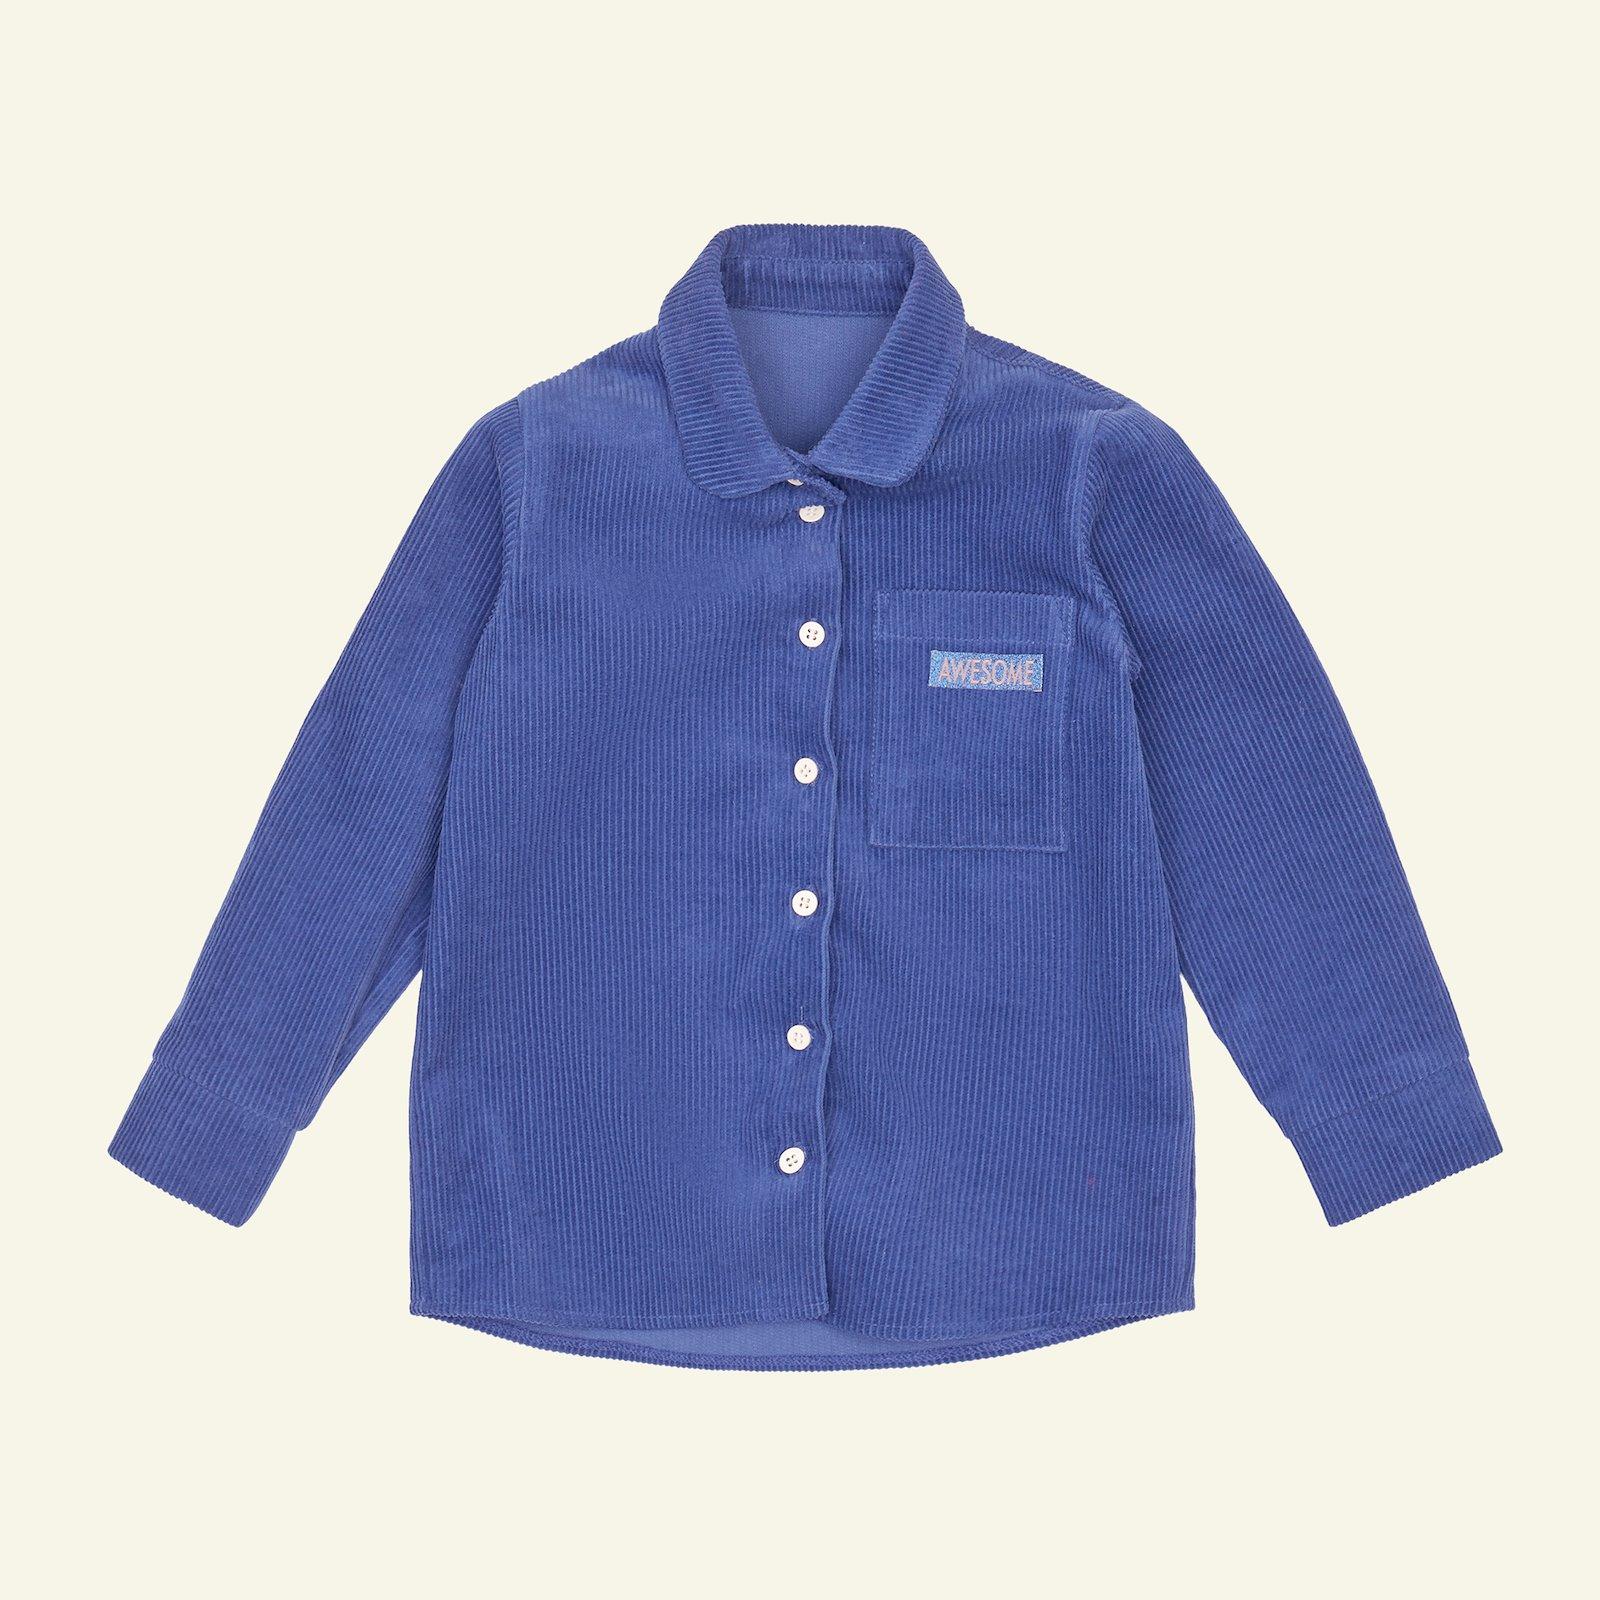 Corduroy 8 wales dark cobalt blue p66011_430820_40102_sskit